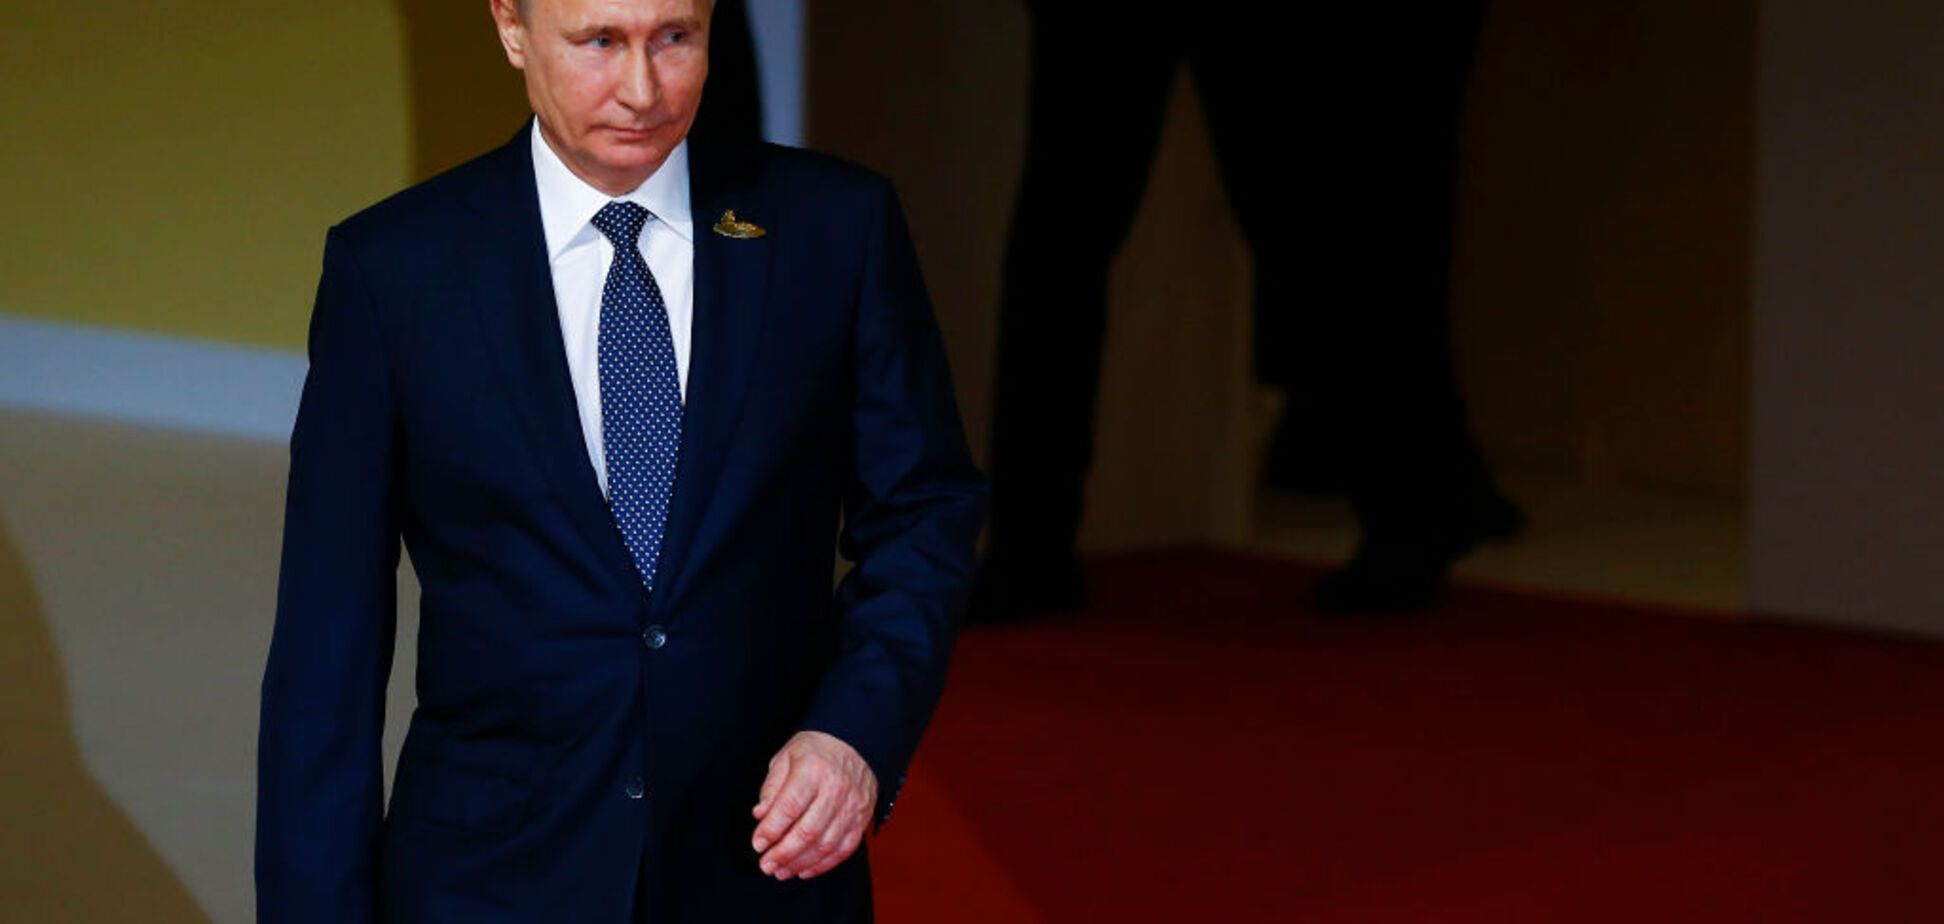 Подачка от Путина: откуда деньги, Зин?